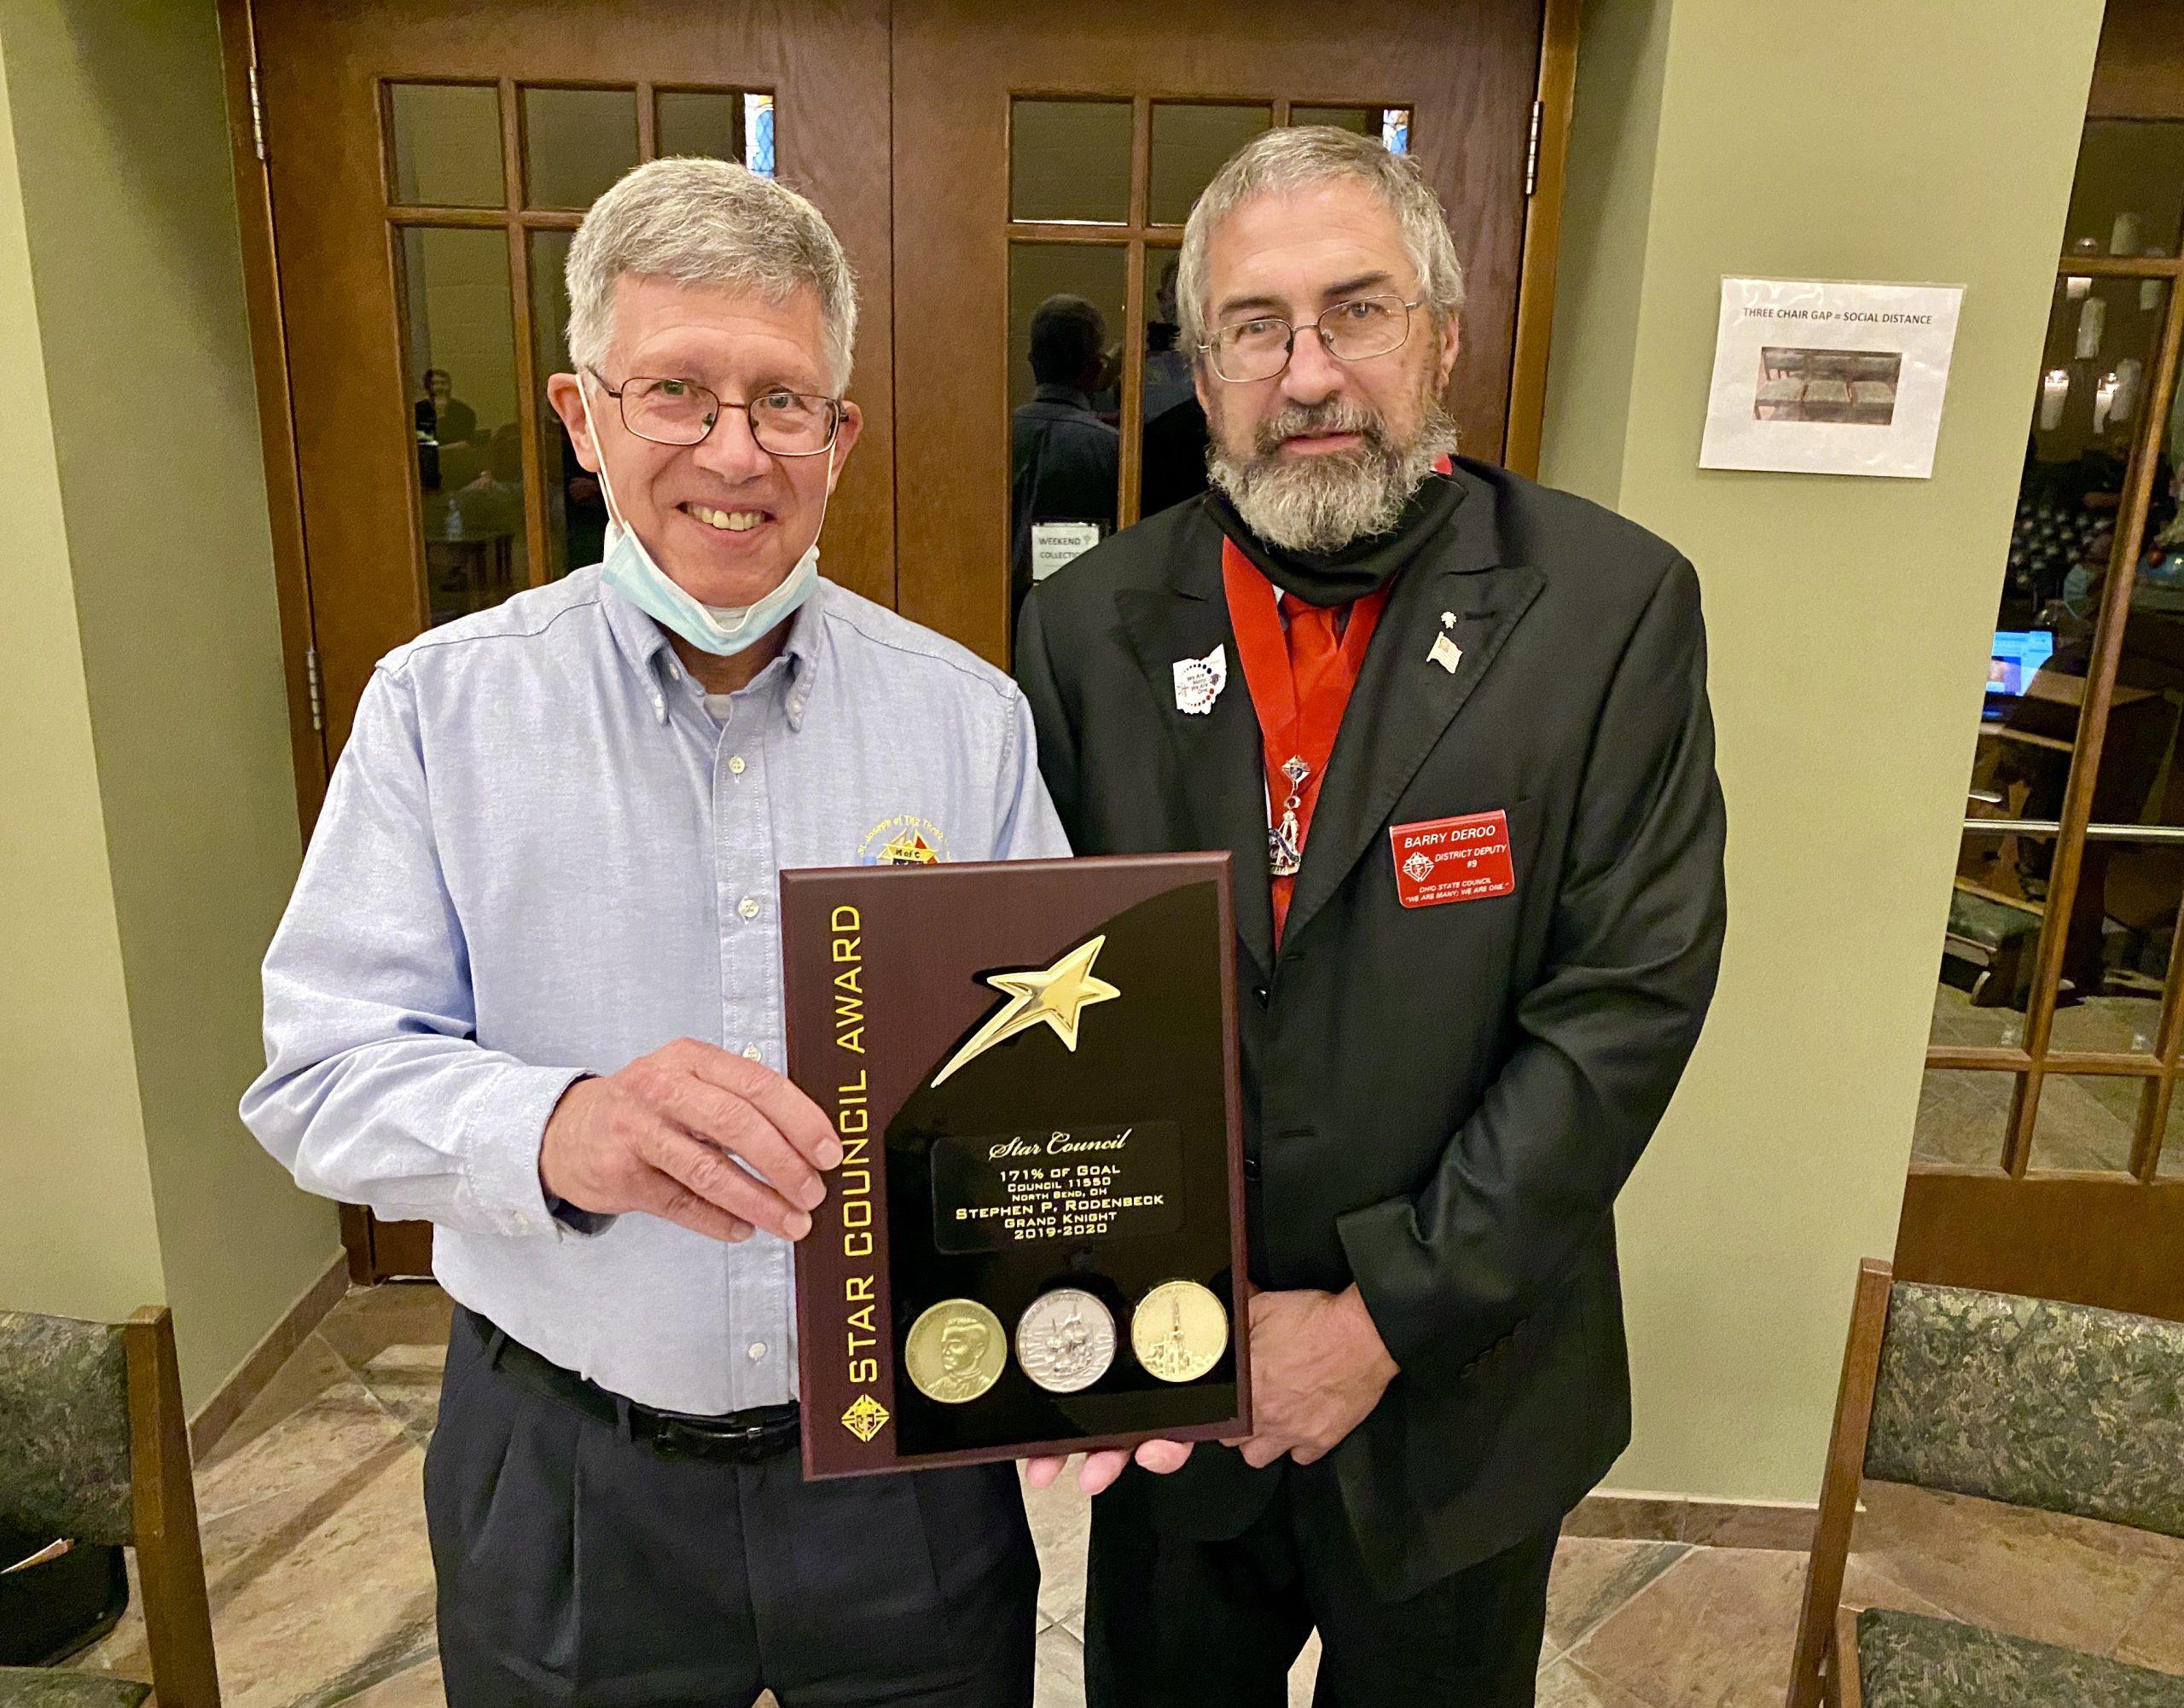 Star Council Award 2019-2020